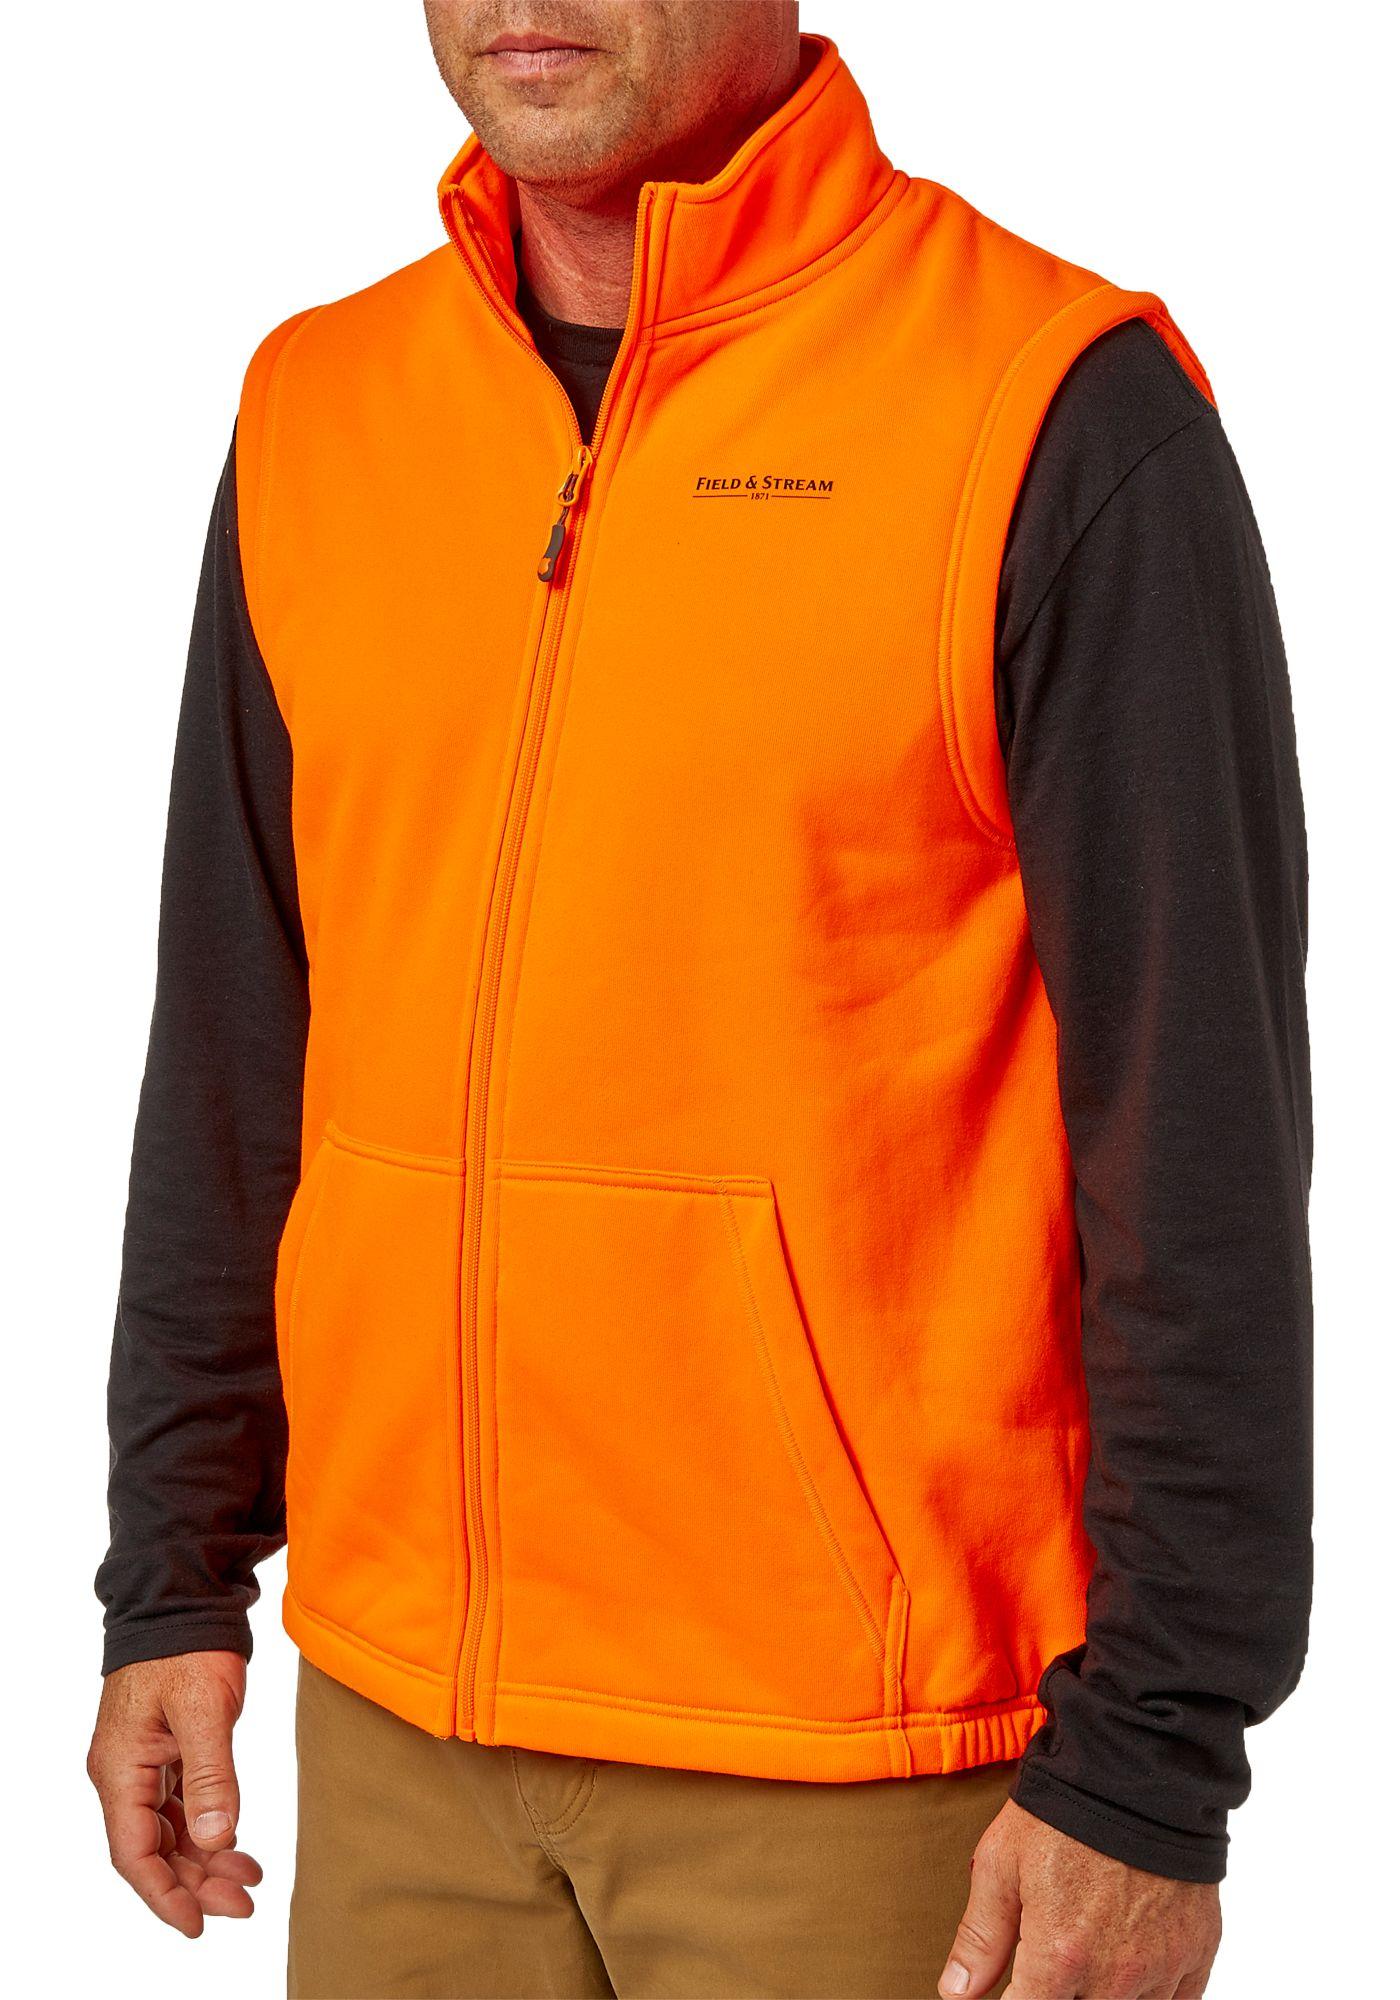 Field & Stream Men's Fleece Blaze Vest